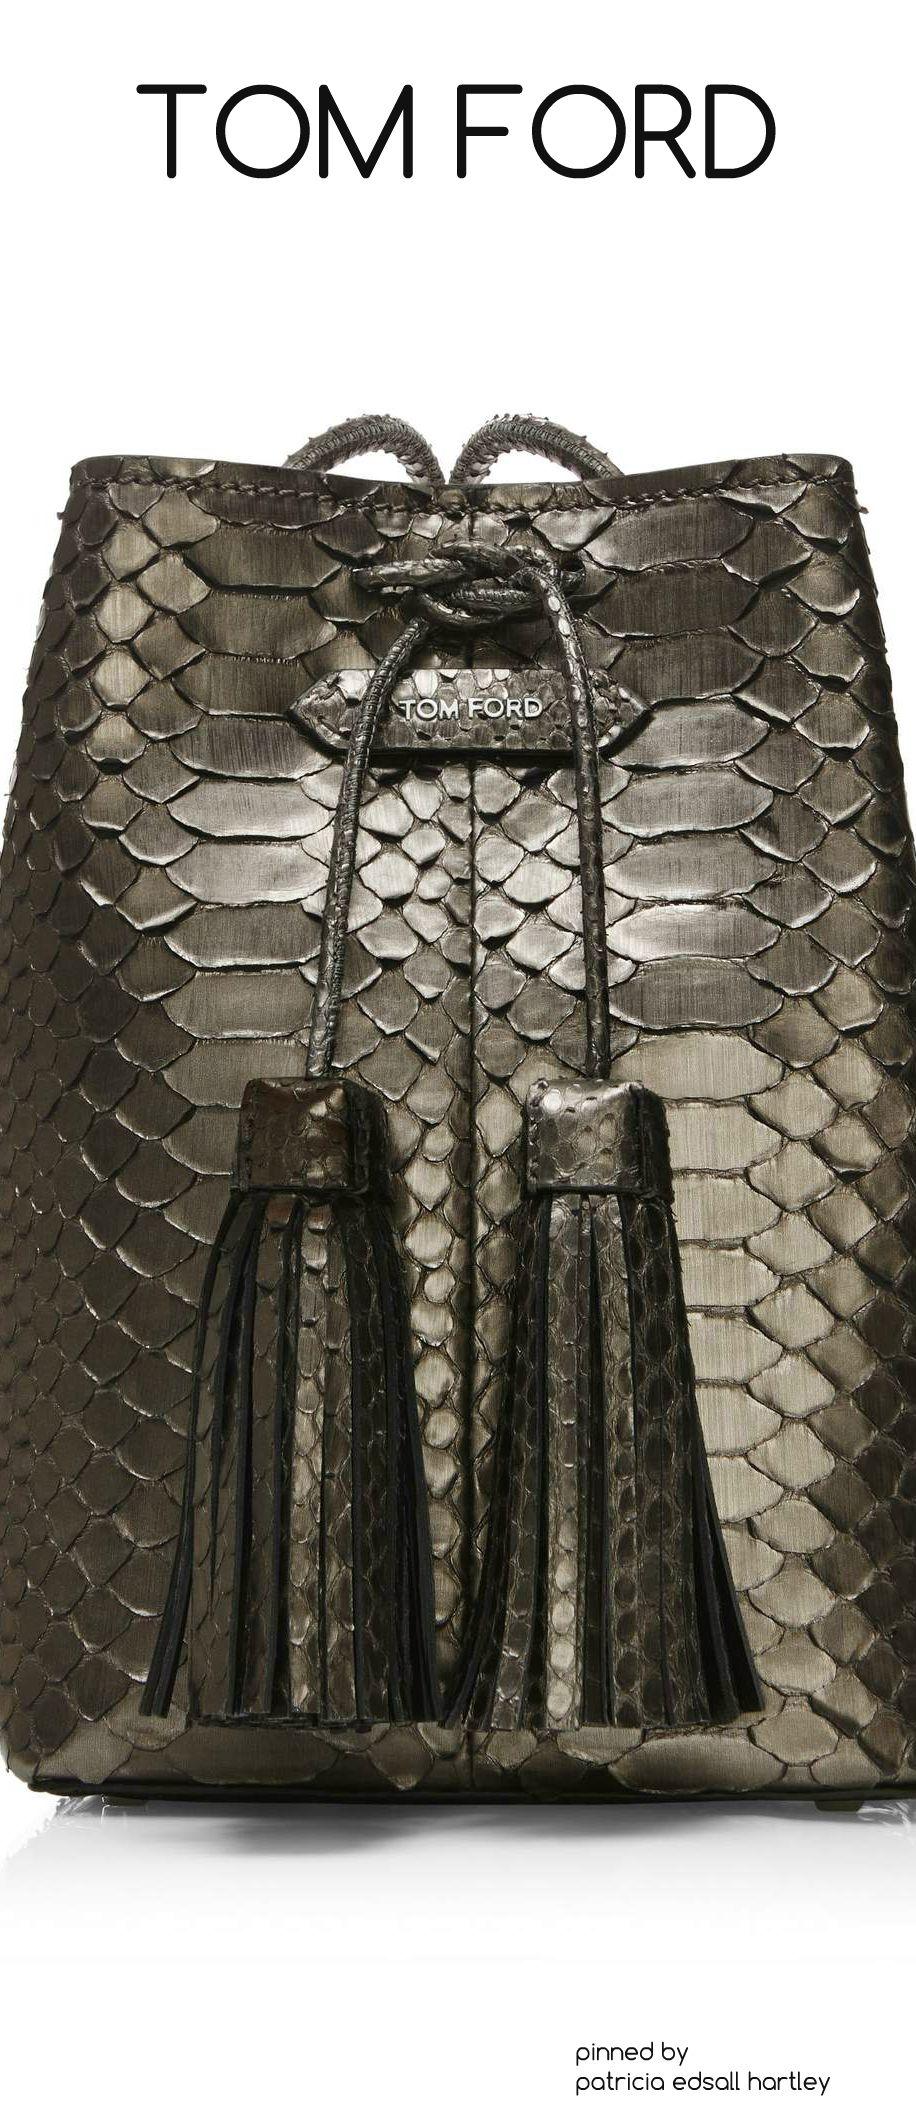 Gorgeous for the season! Clothing, Shoes & Jewelry - women's handbags & wallets - http://amzn.to/2j9xWYI